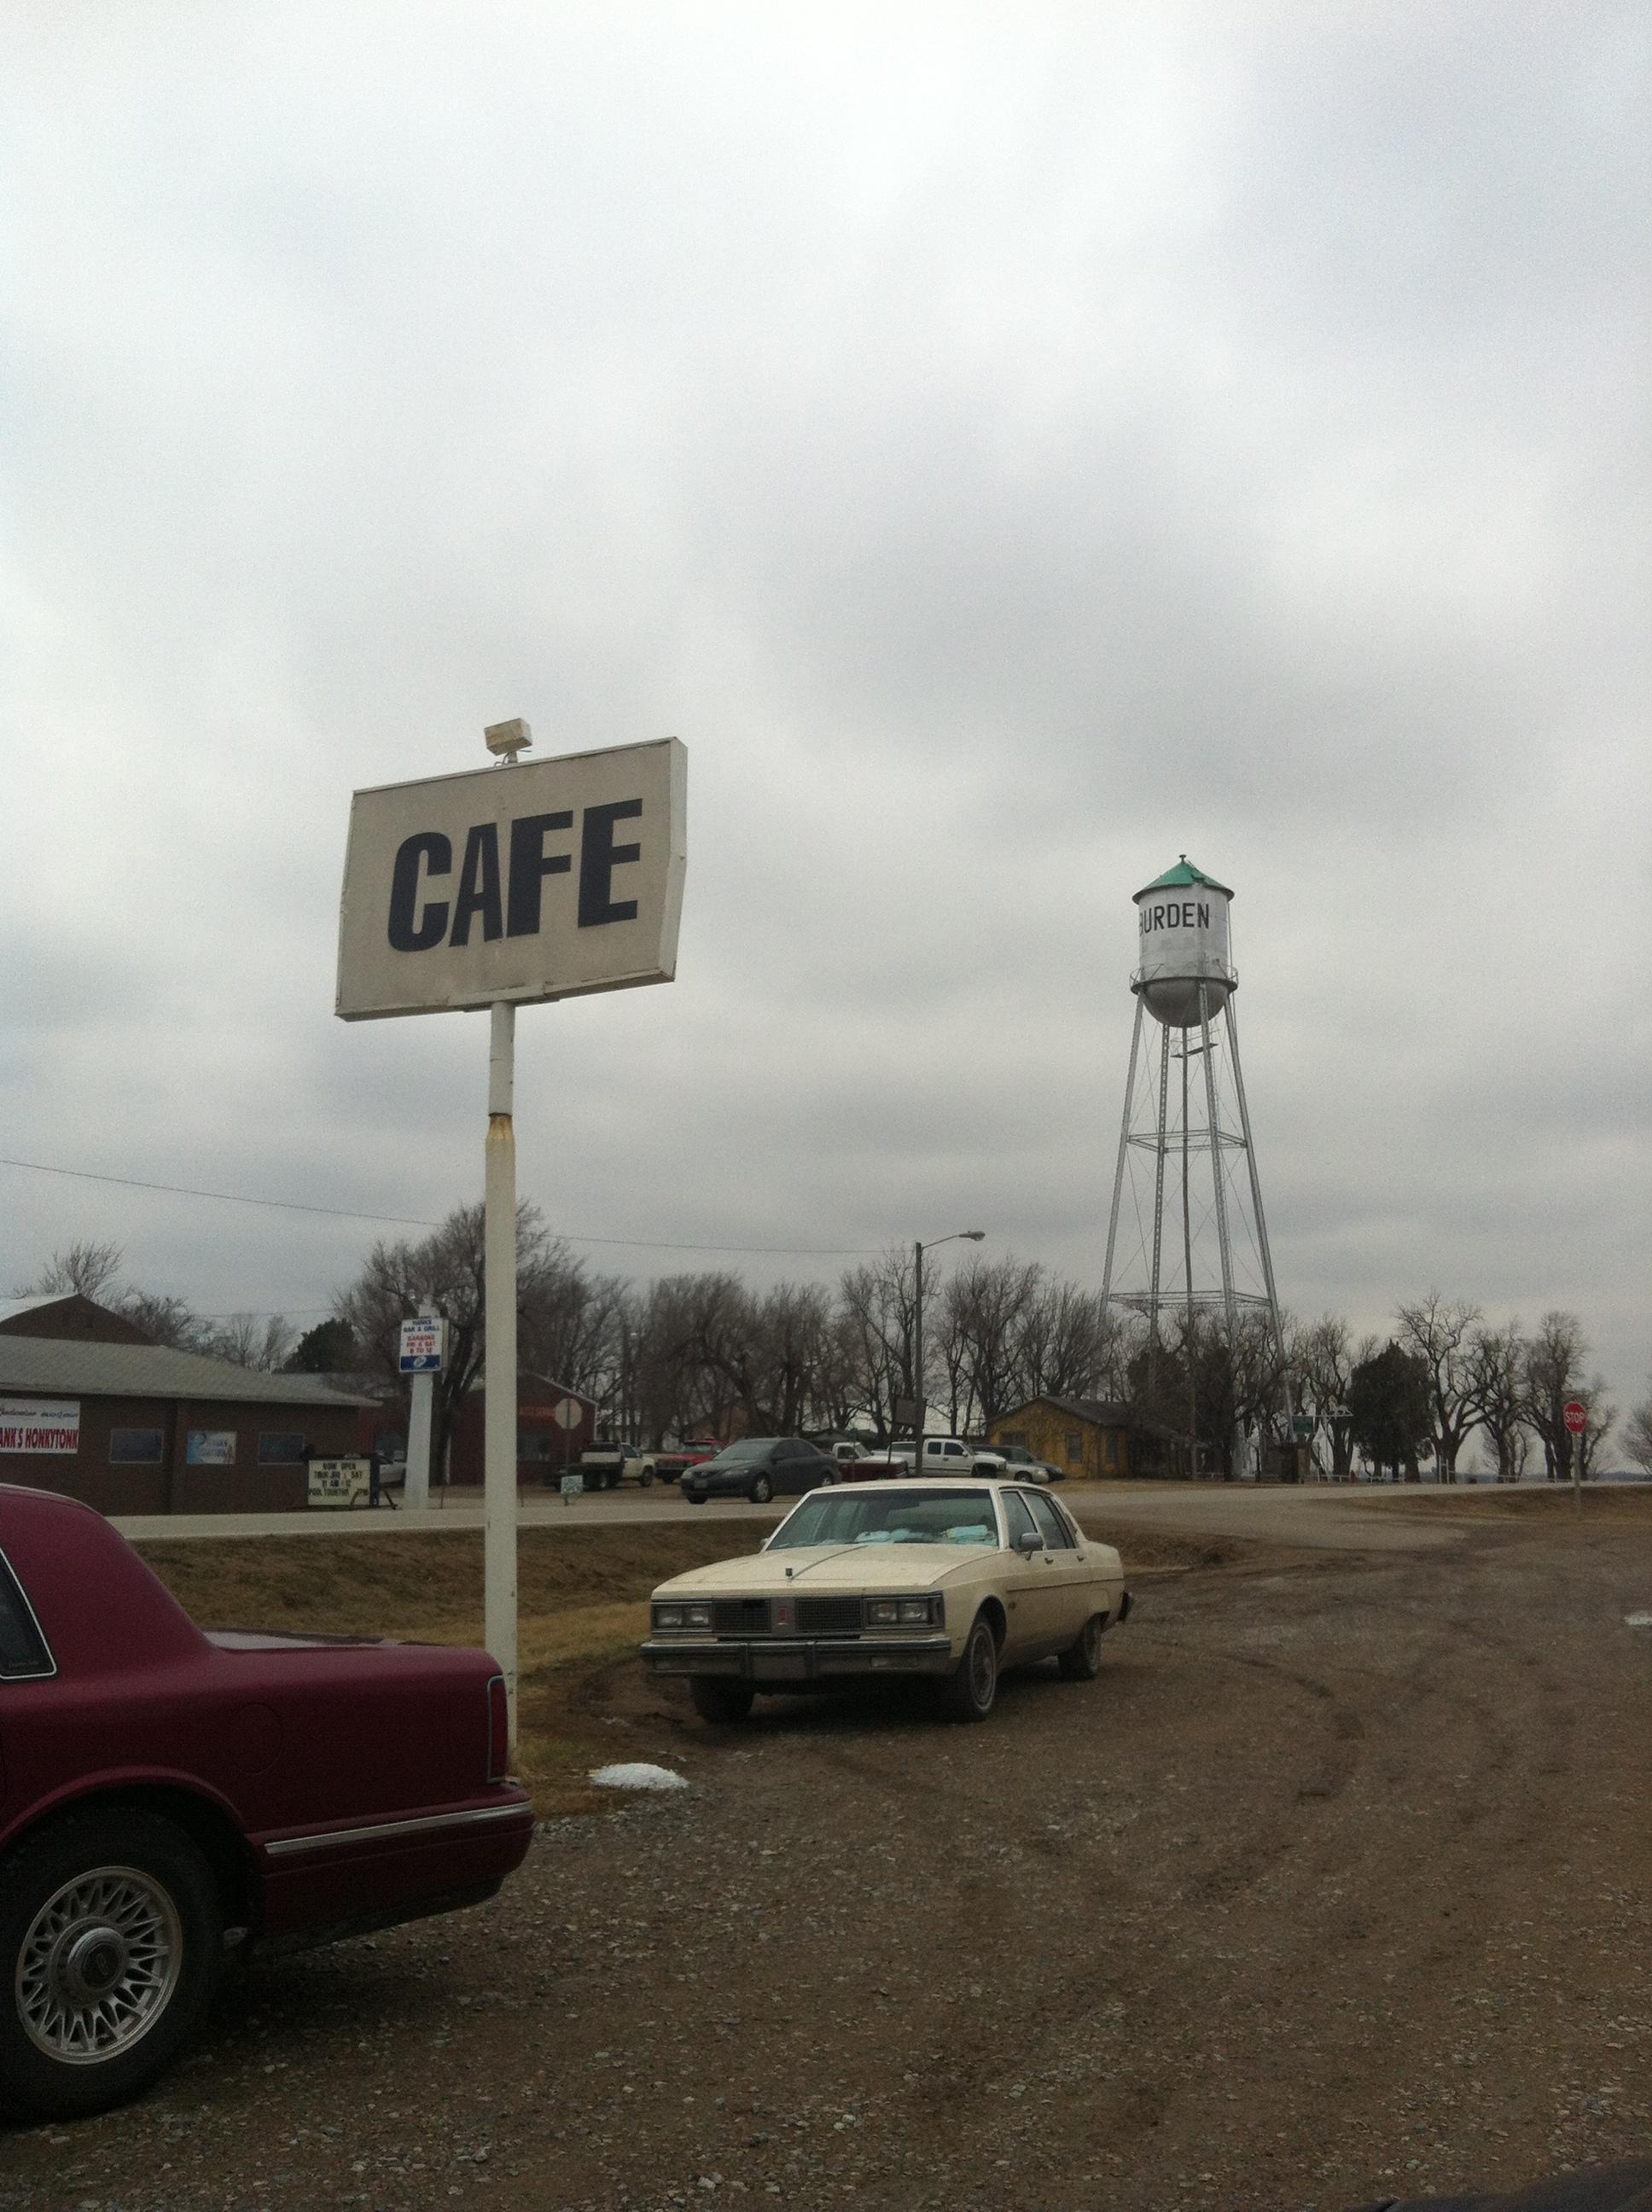 160 Cafe, Burden